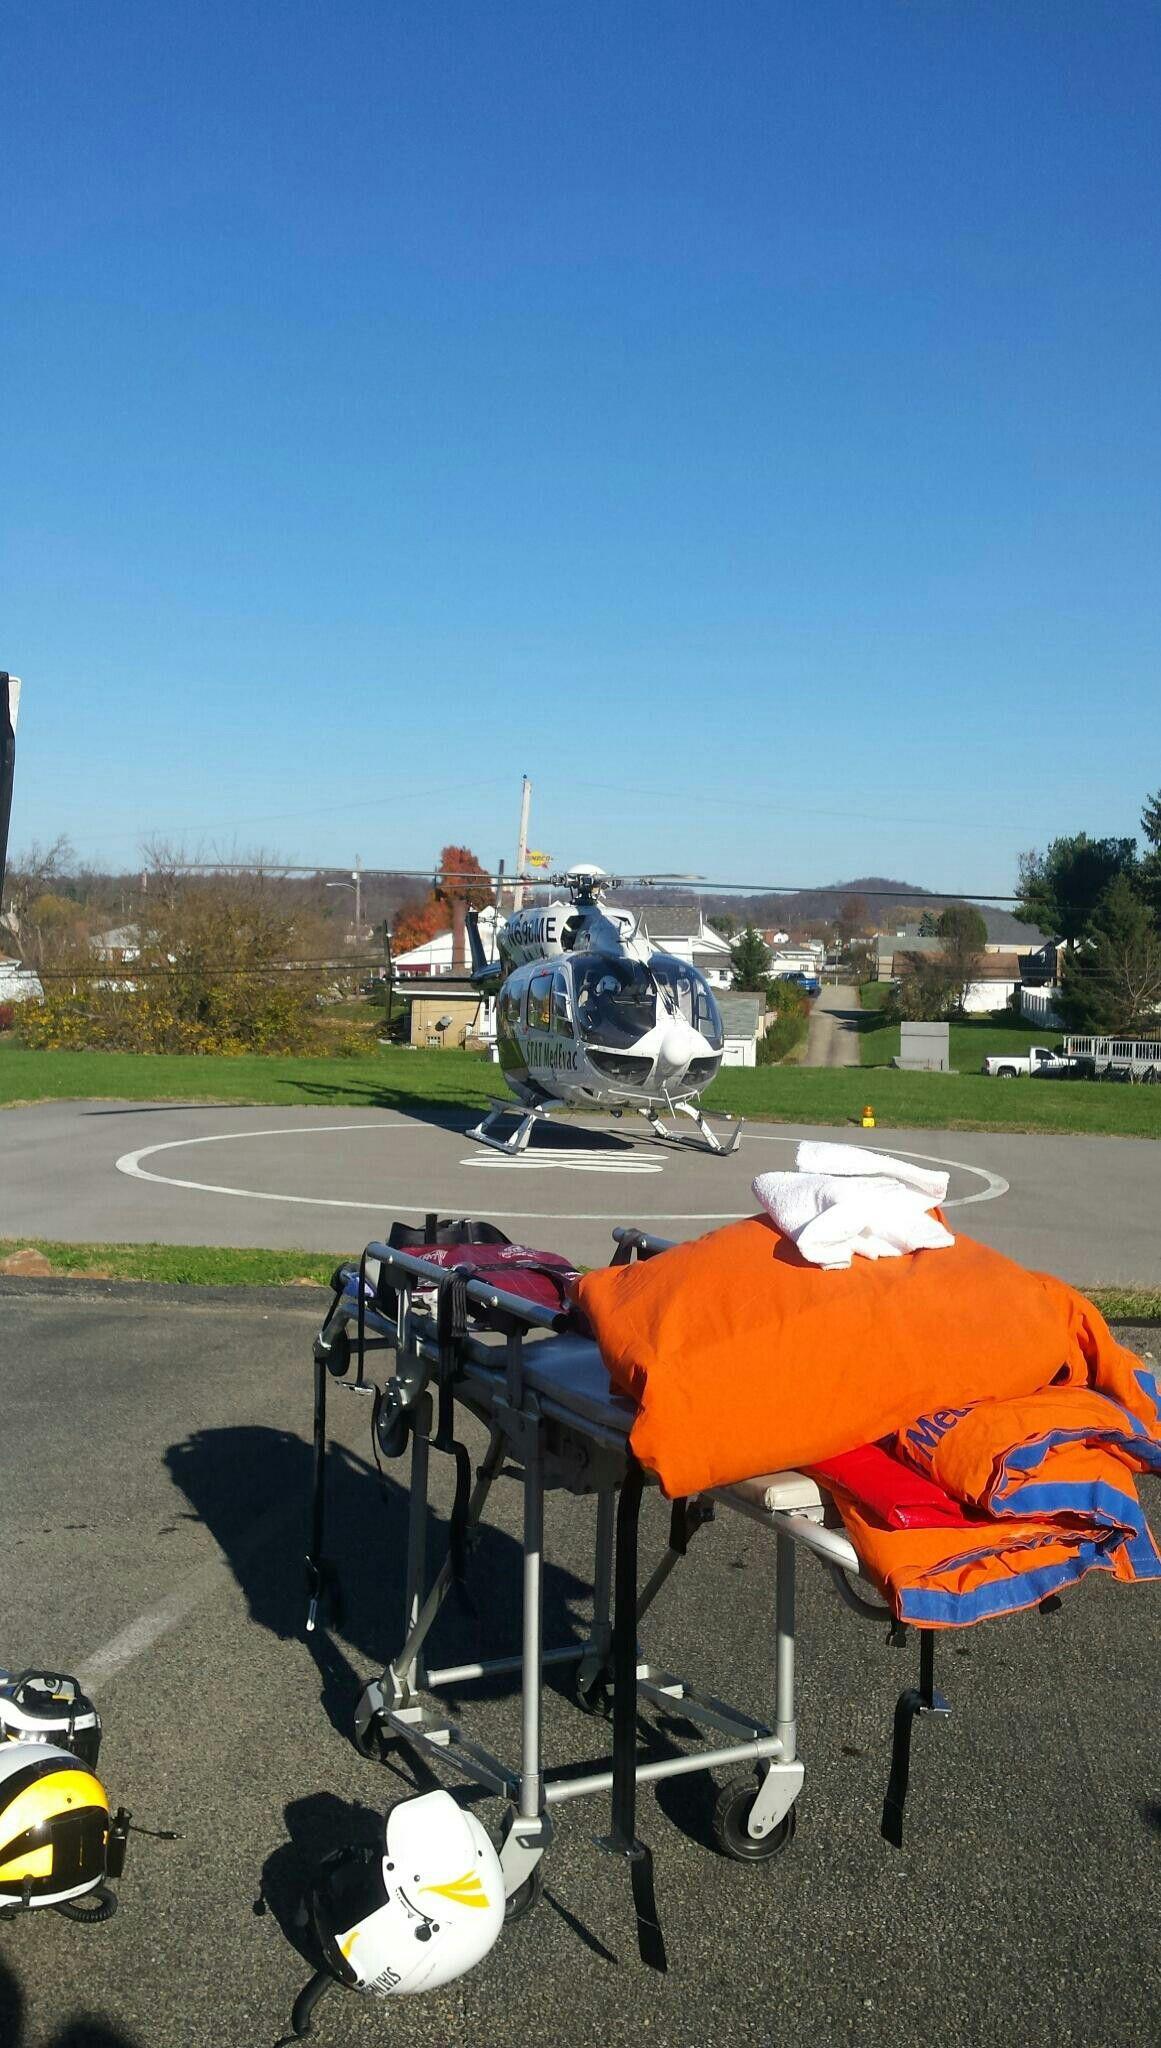 4a8c5b7e097 Pin de Gilsa em Helicóptero